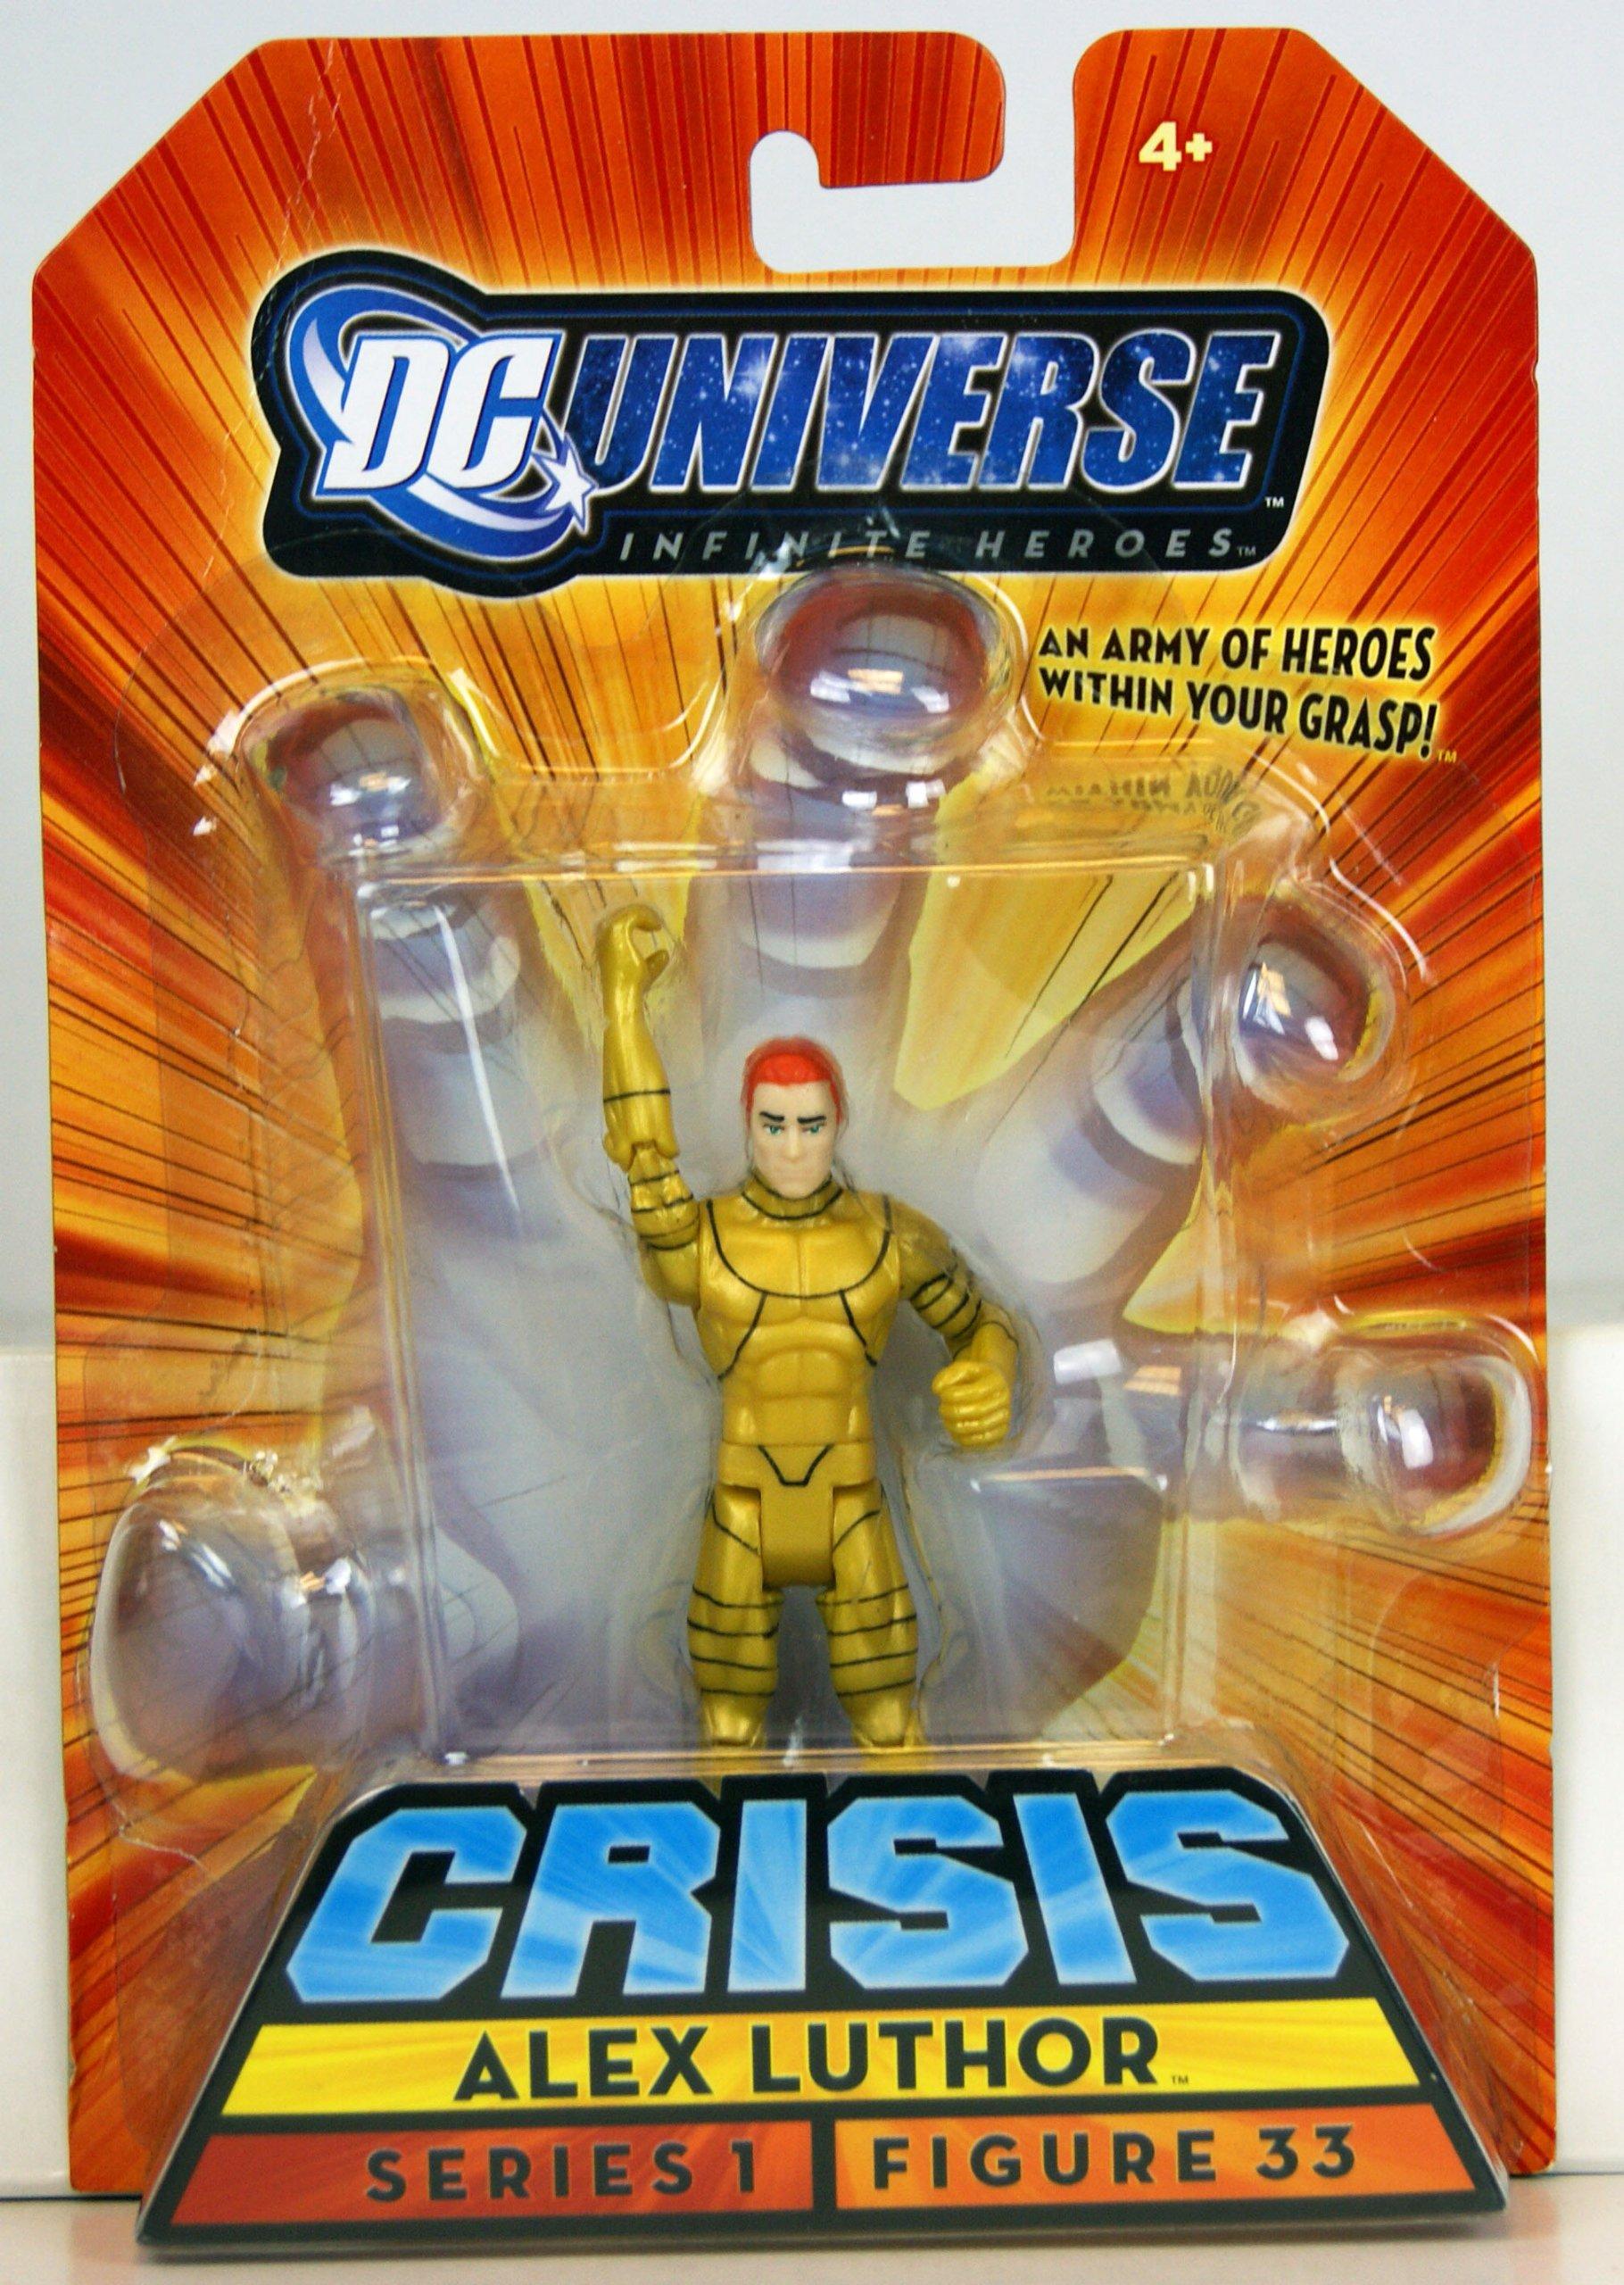 Mattel DC Universe Crisis Infinite Heroes Series 1 Alex Luthor Action Figure #33